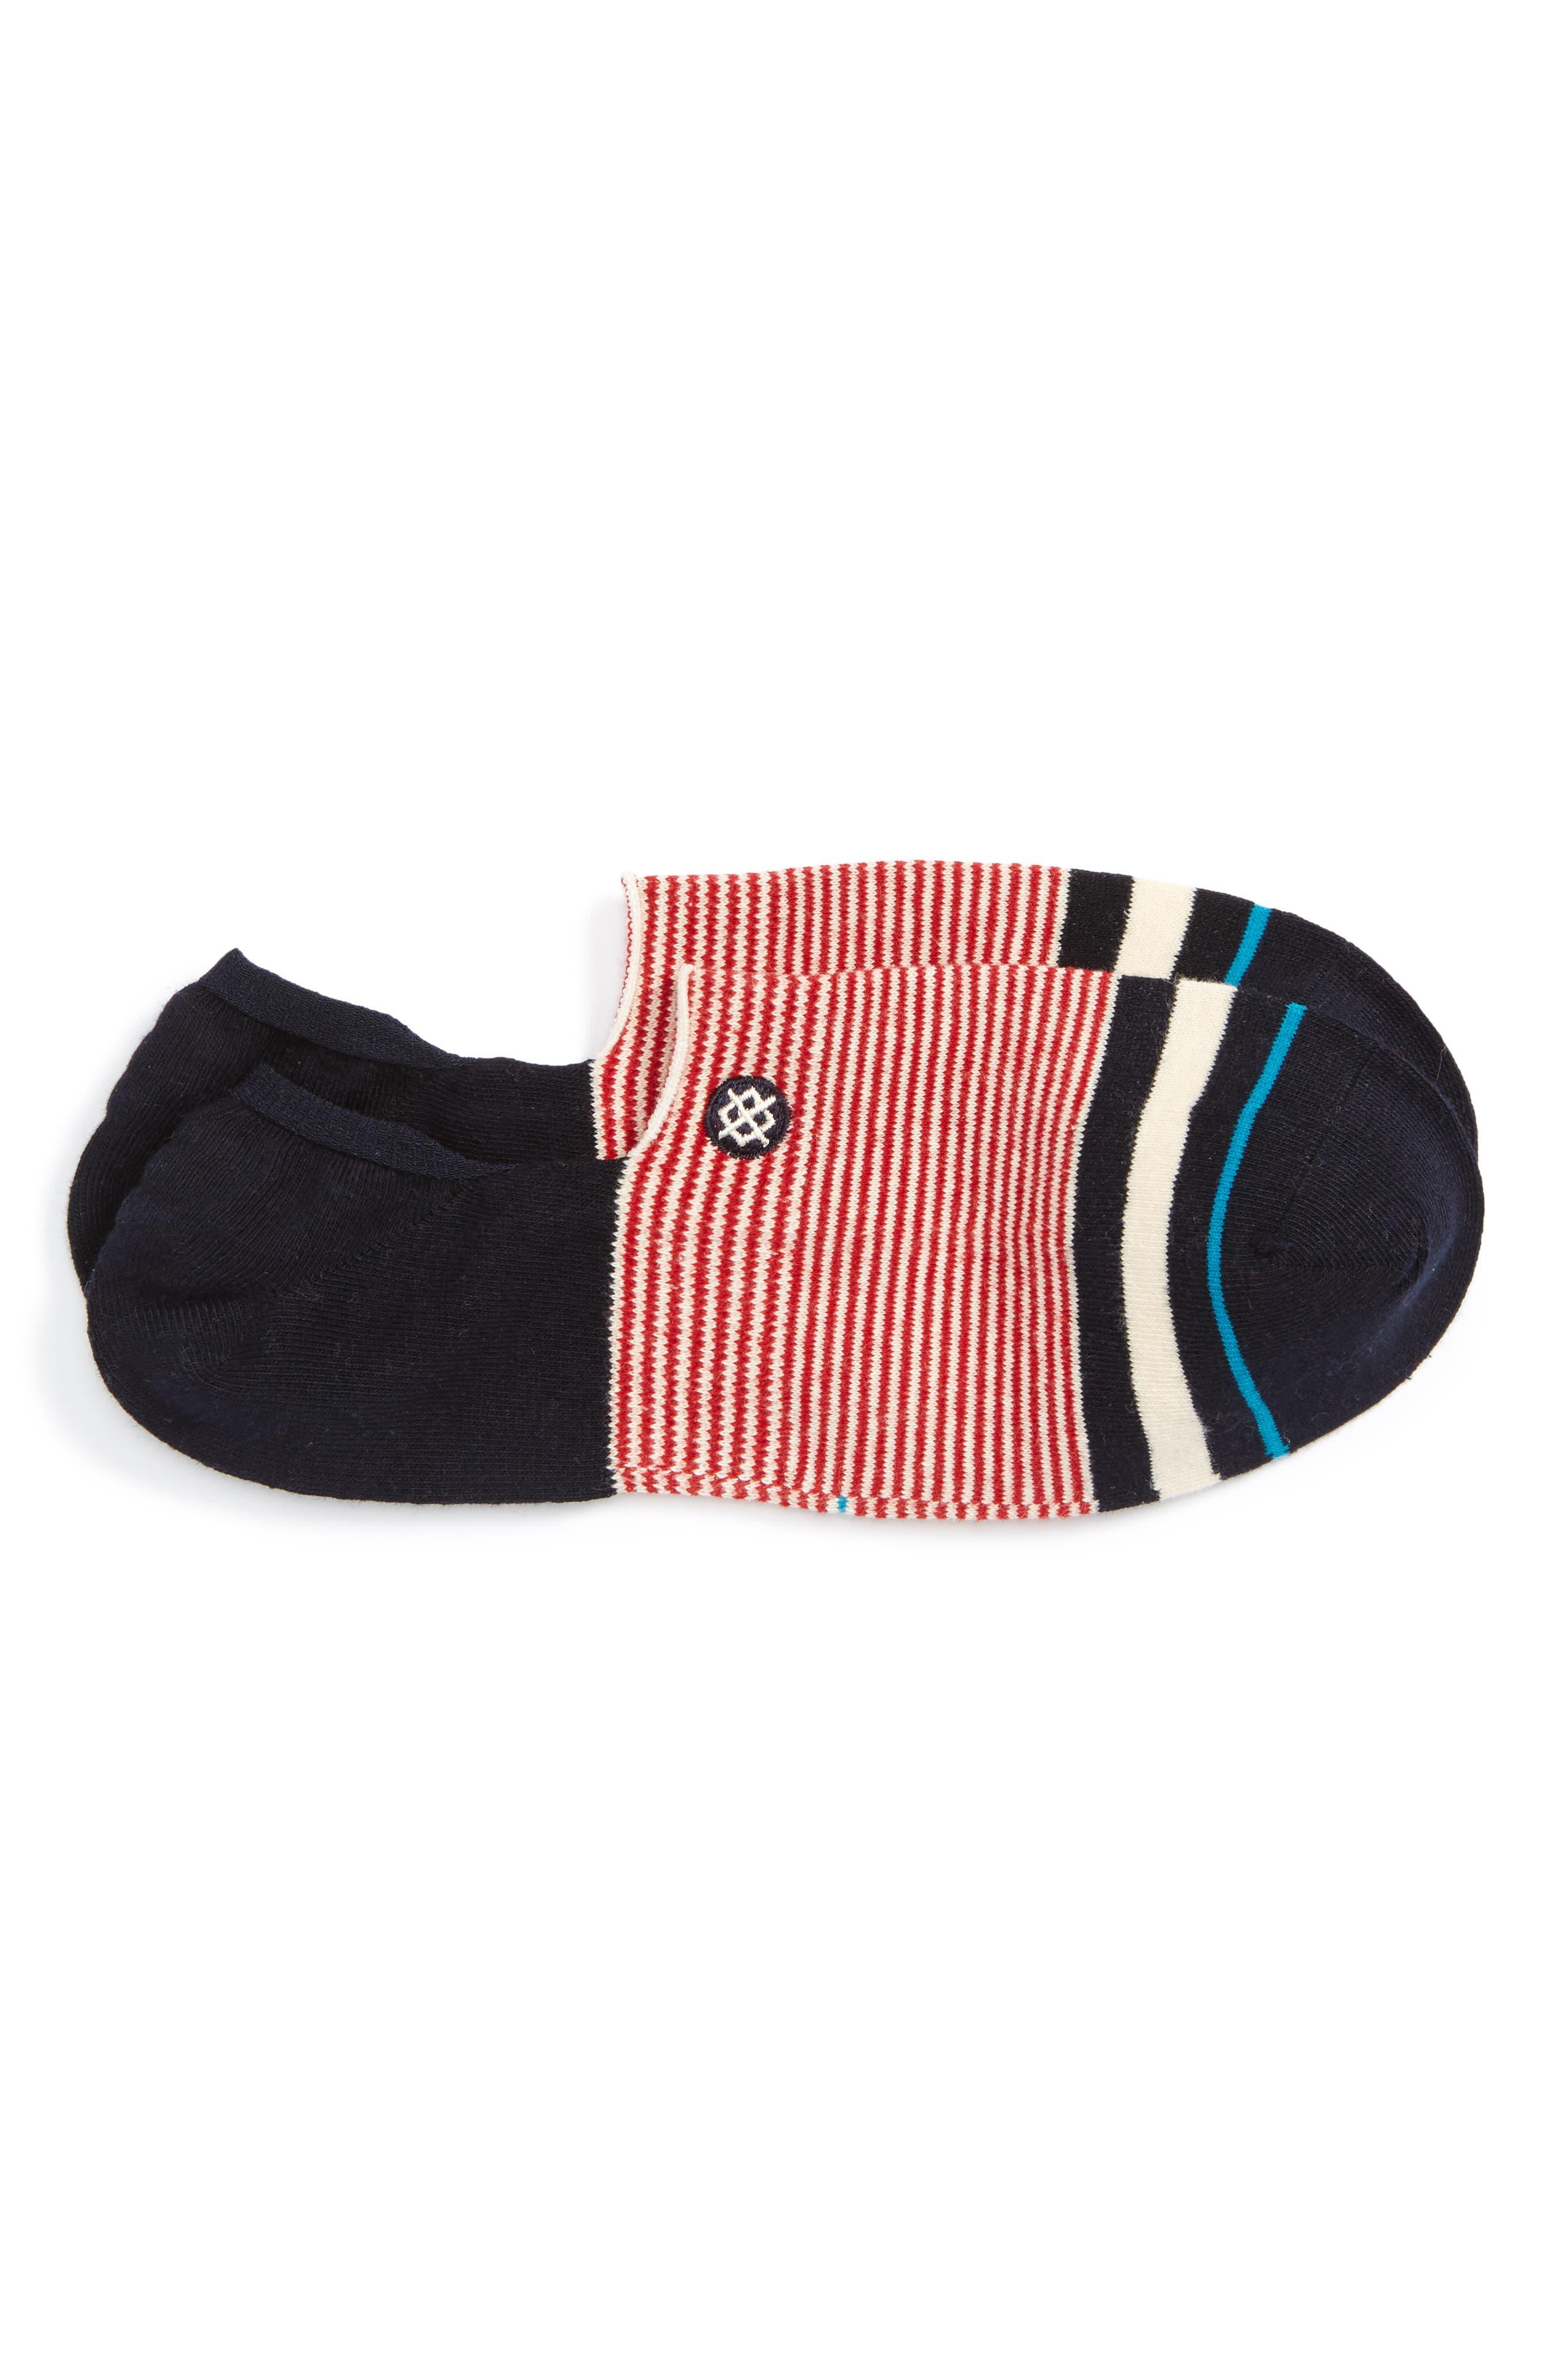 Main Image - Stance Americana No-Show Socks